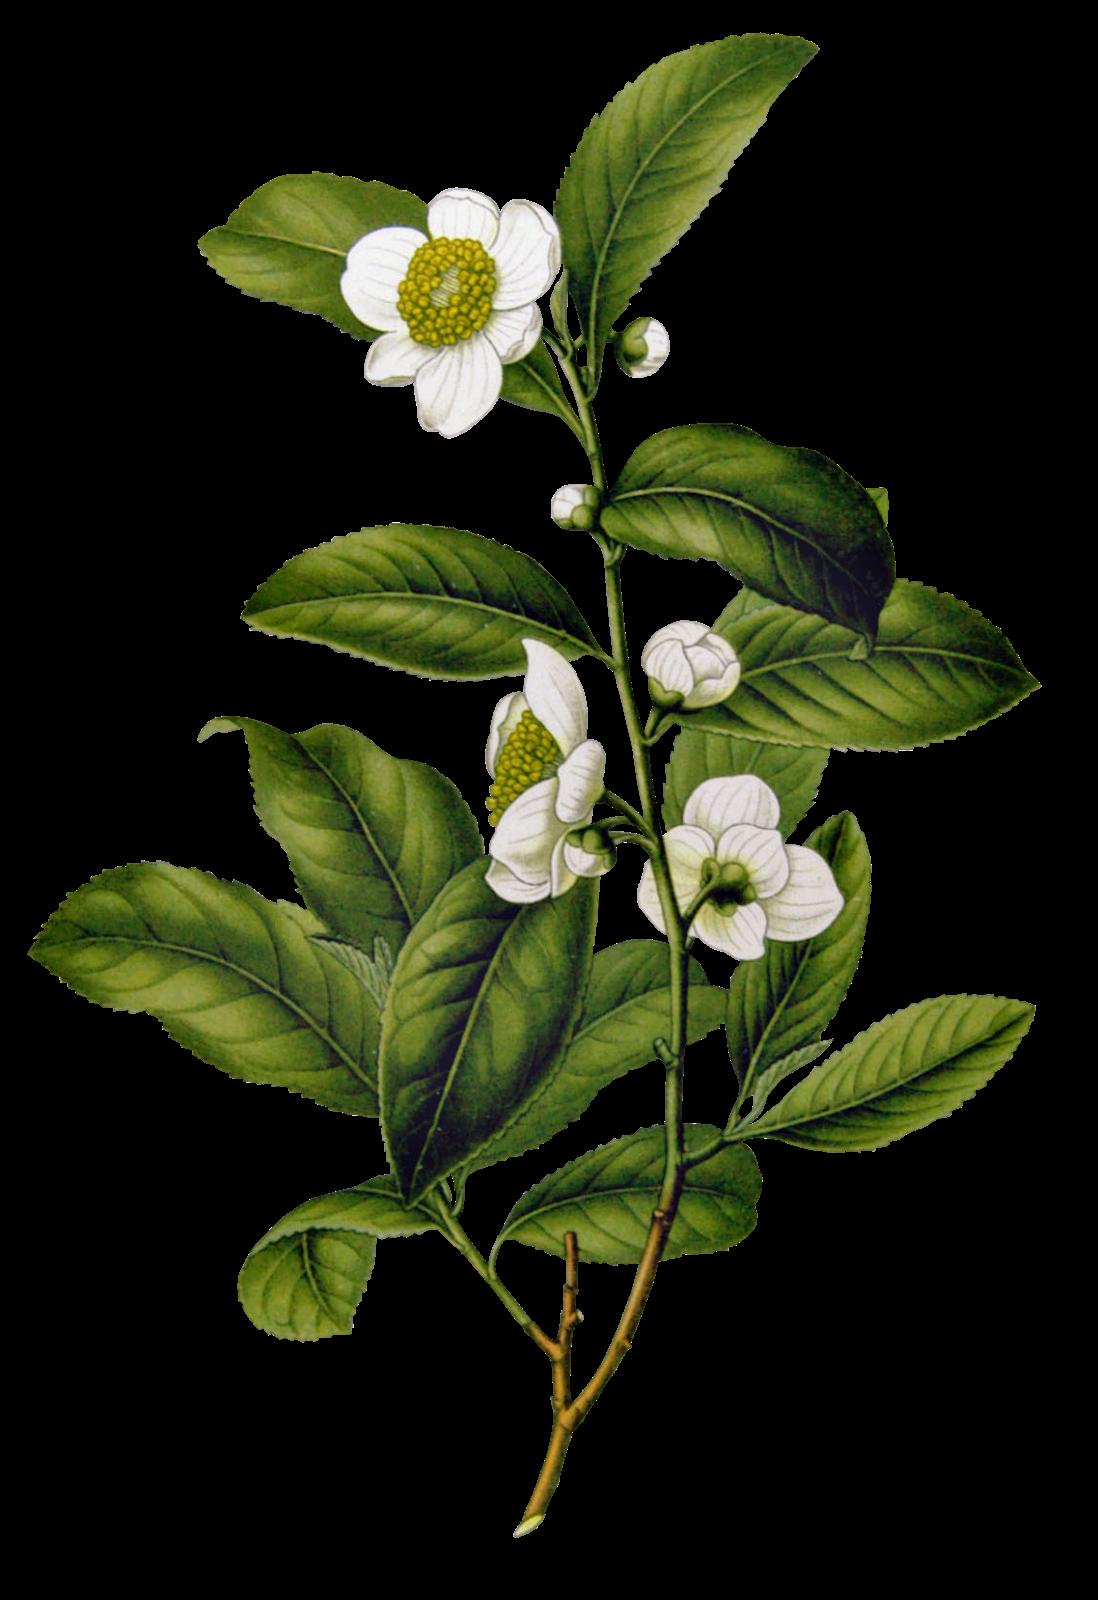 ARIE CELLULAR: Koleksi Gambar Bunga Format PNG